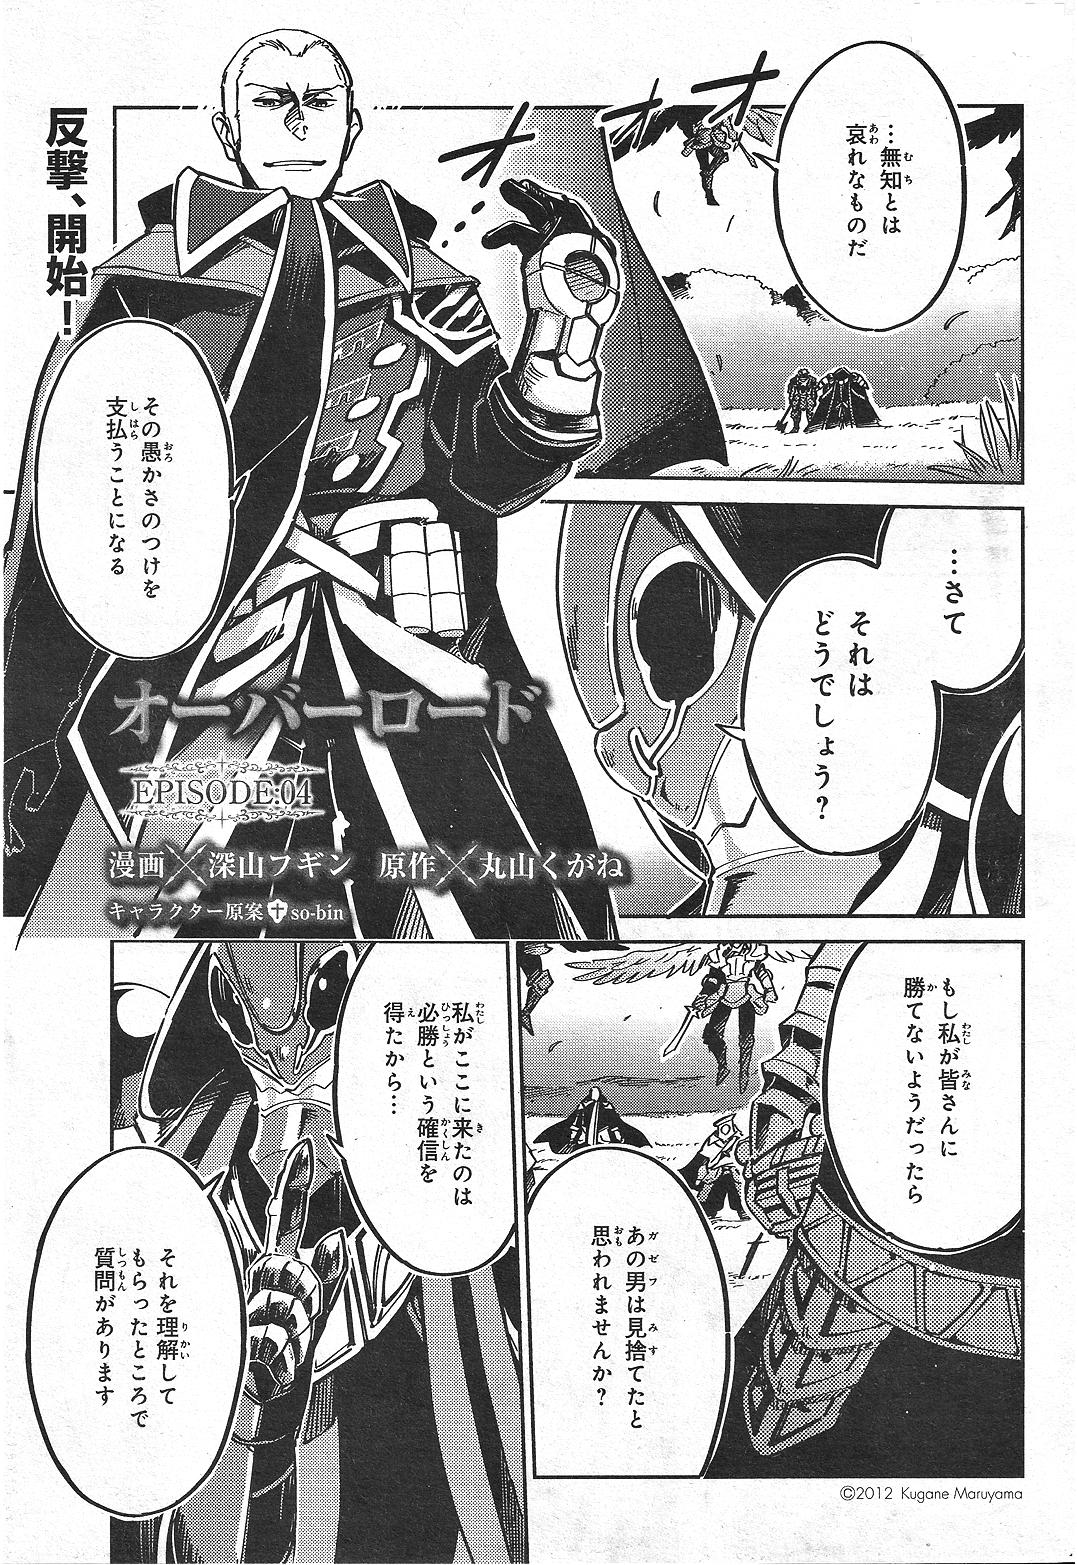 Overlord Manga Chapter 04